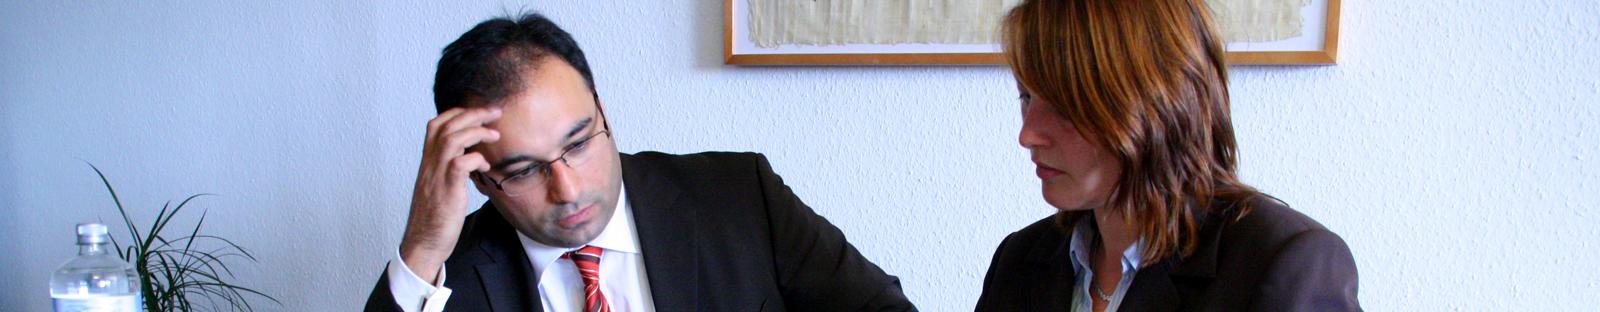 Anwaltskanzlei Doc Rechtsanwälte Hamburg